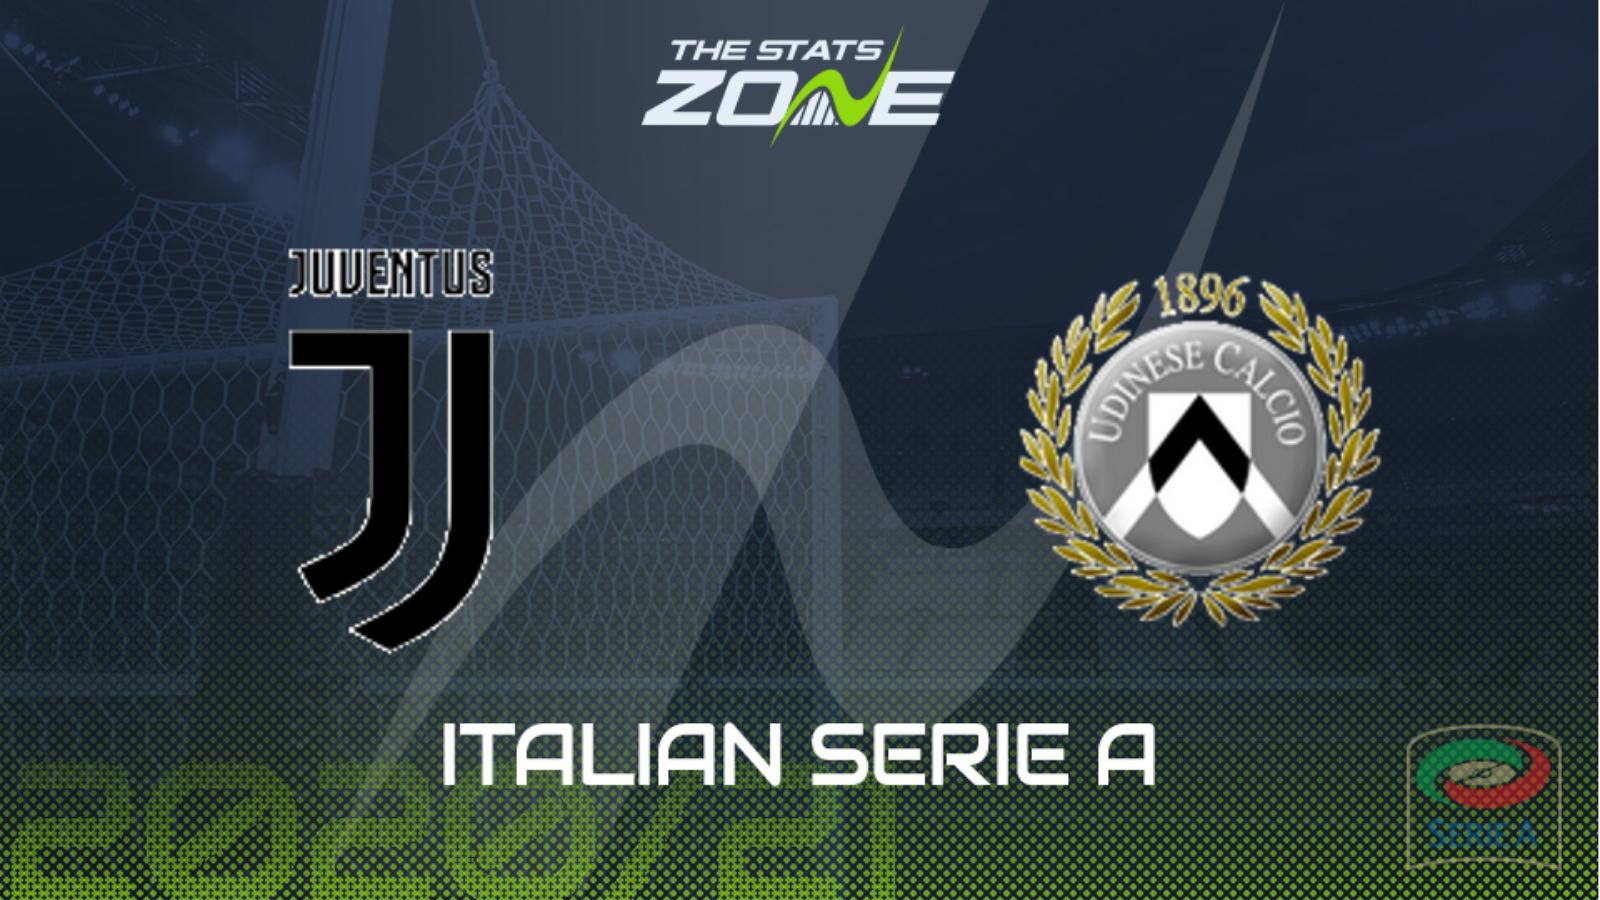 Juventus vs udinese betting previews sevilla vs malaga betting preview nfl